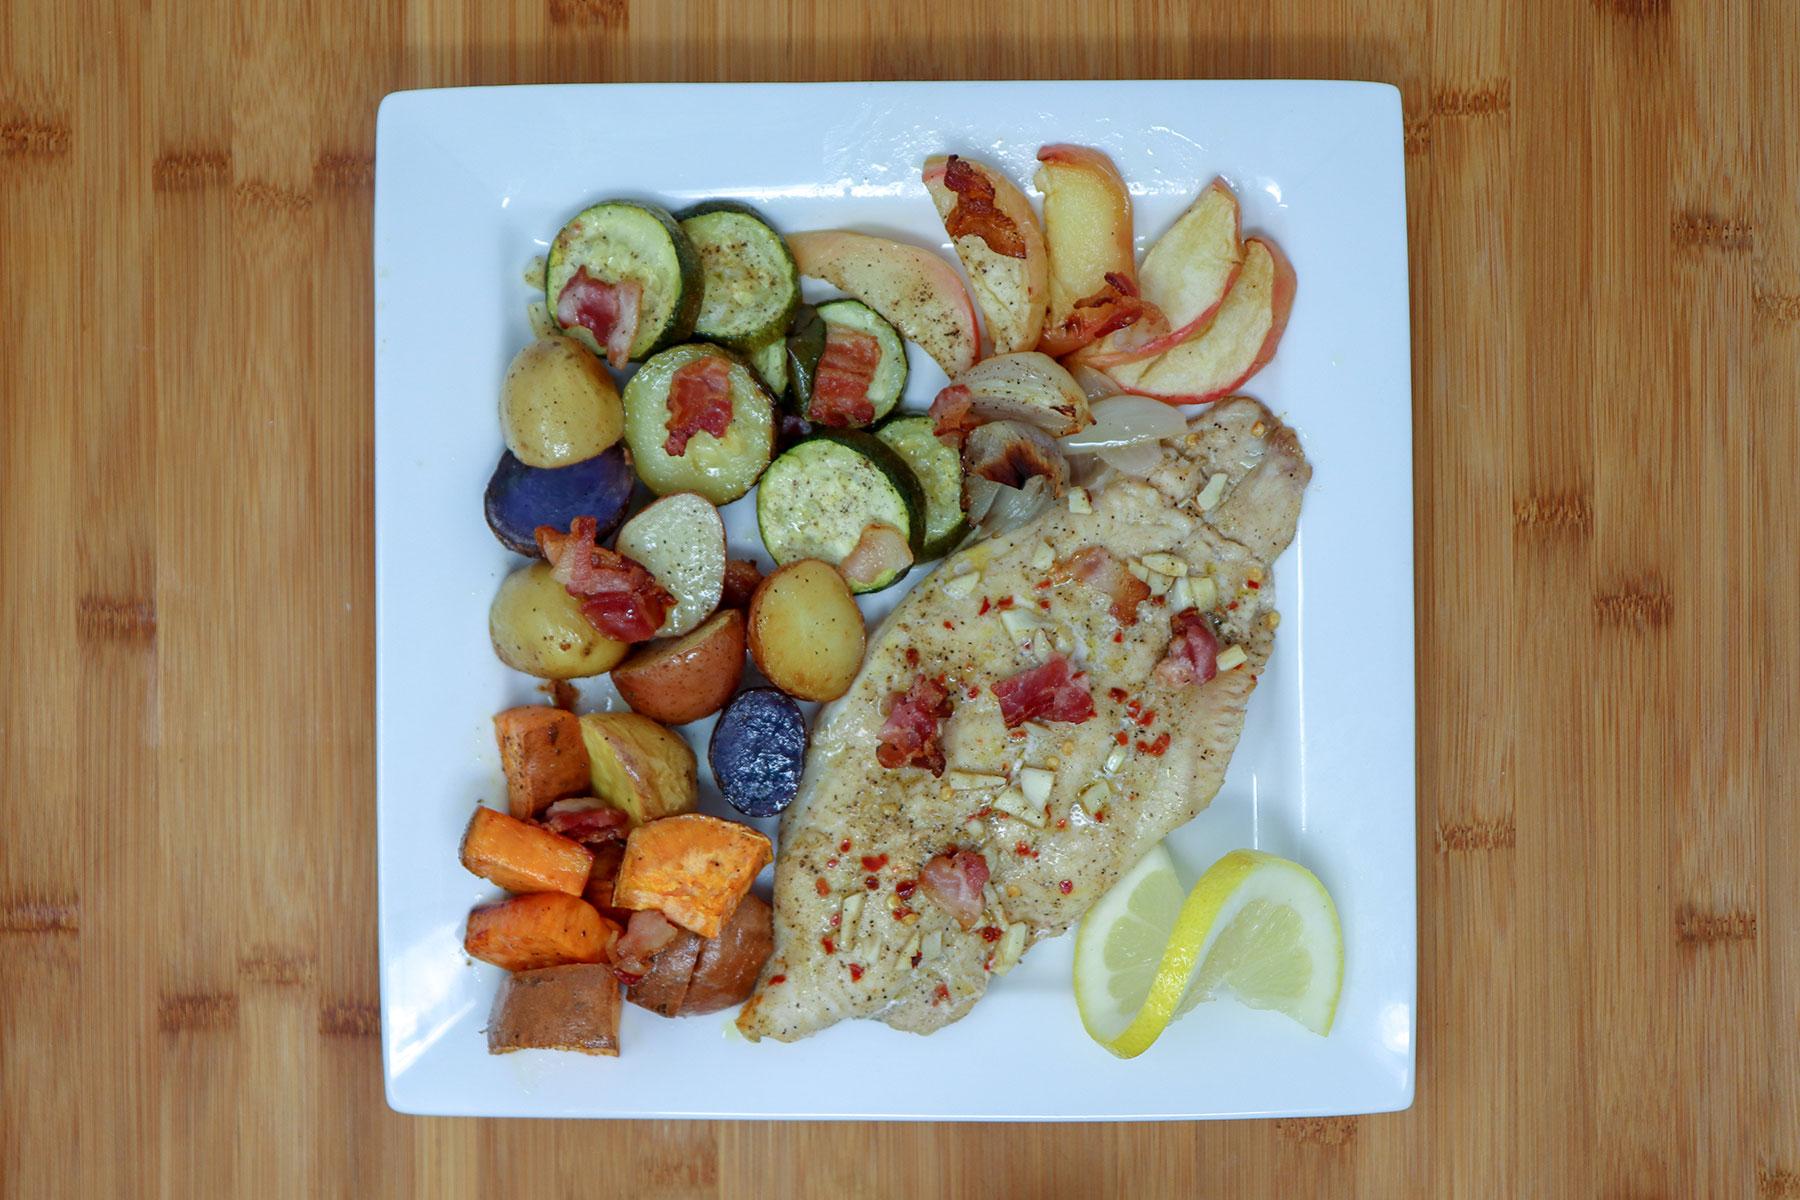 finished sheet pan catfish and veggies on plate